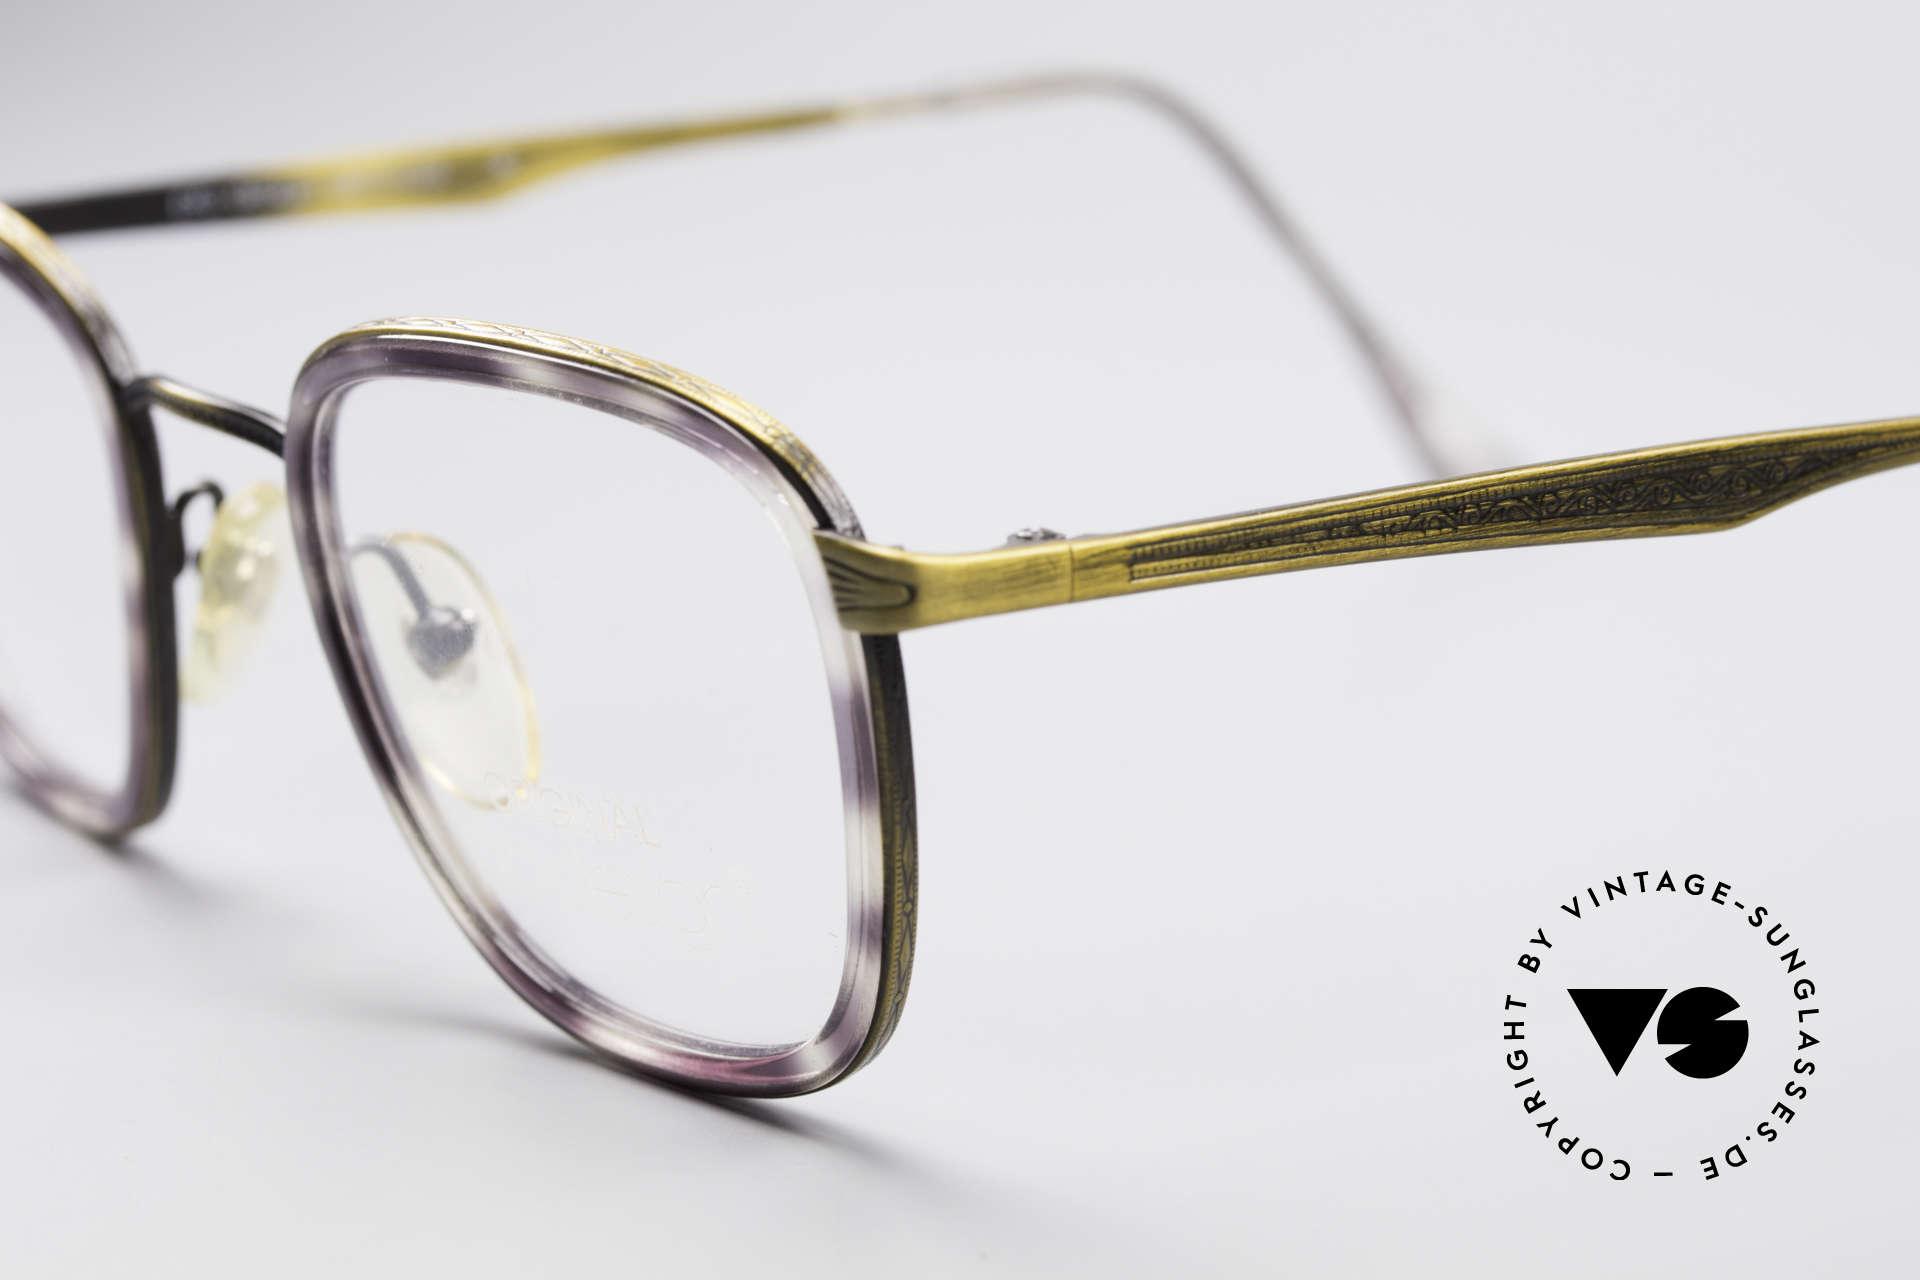 ProDesign Denmark Club 88A Vintage Glasses, great color combination (purple havana / brass), Made for Men